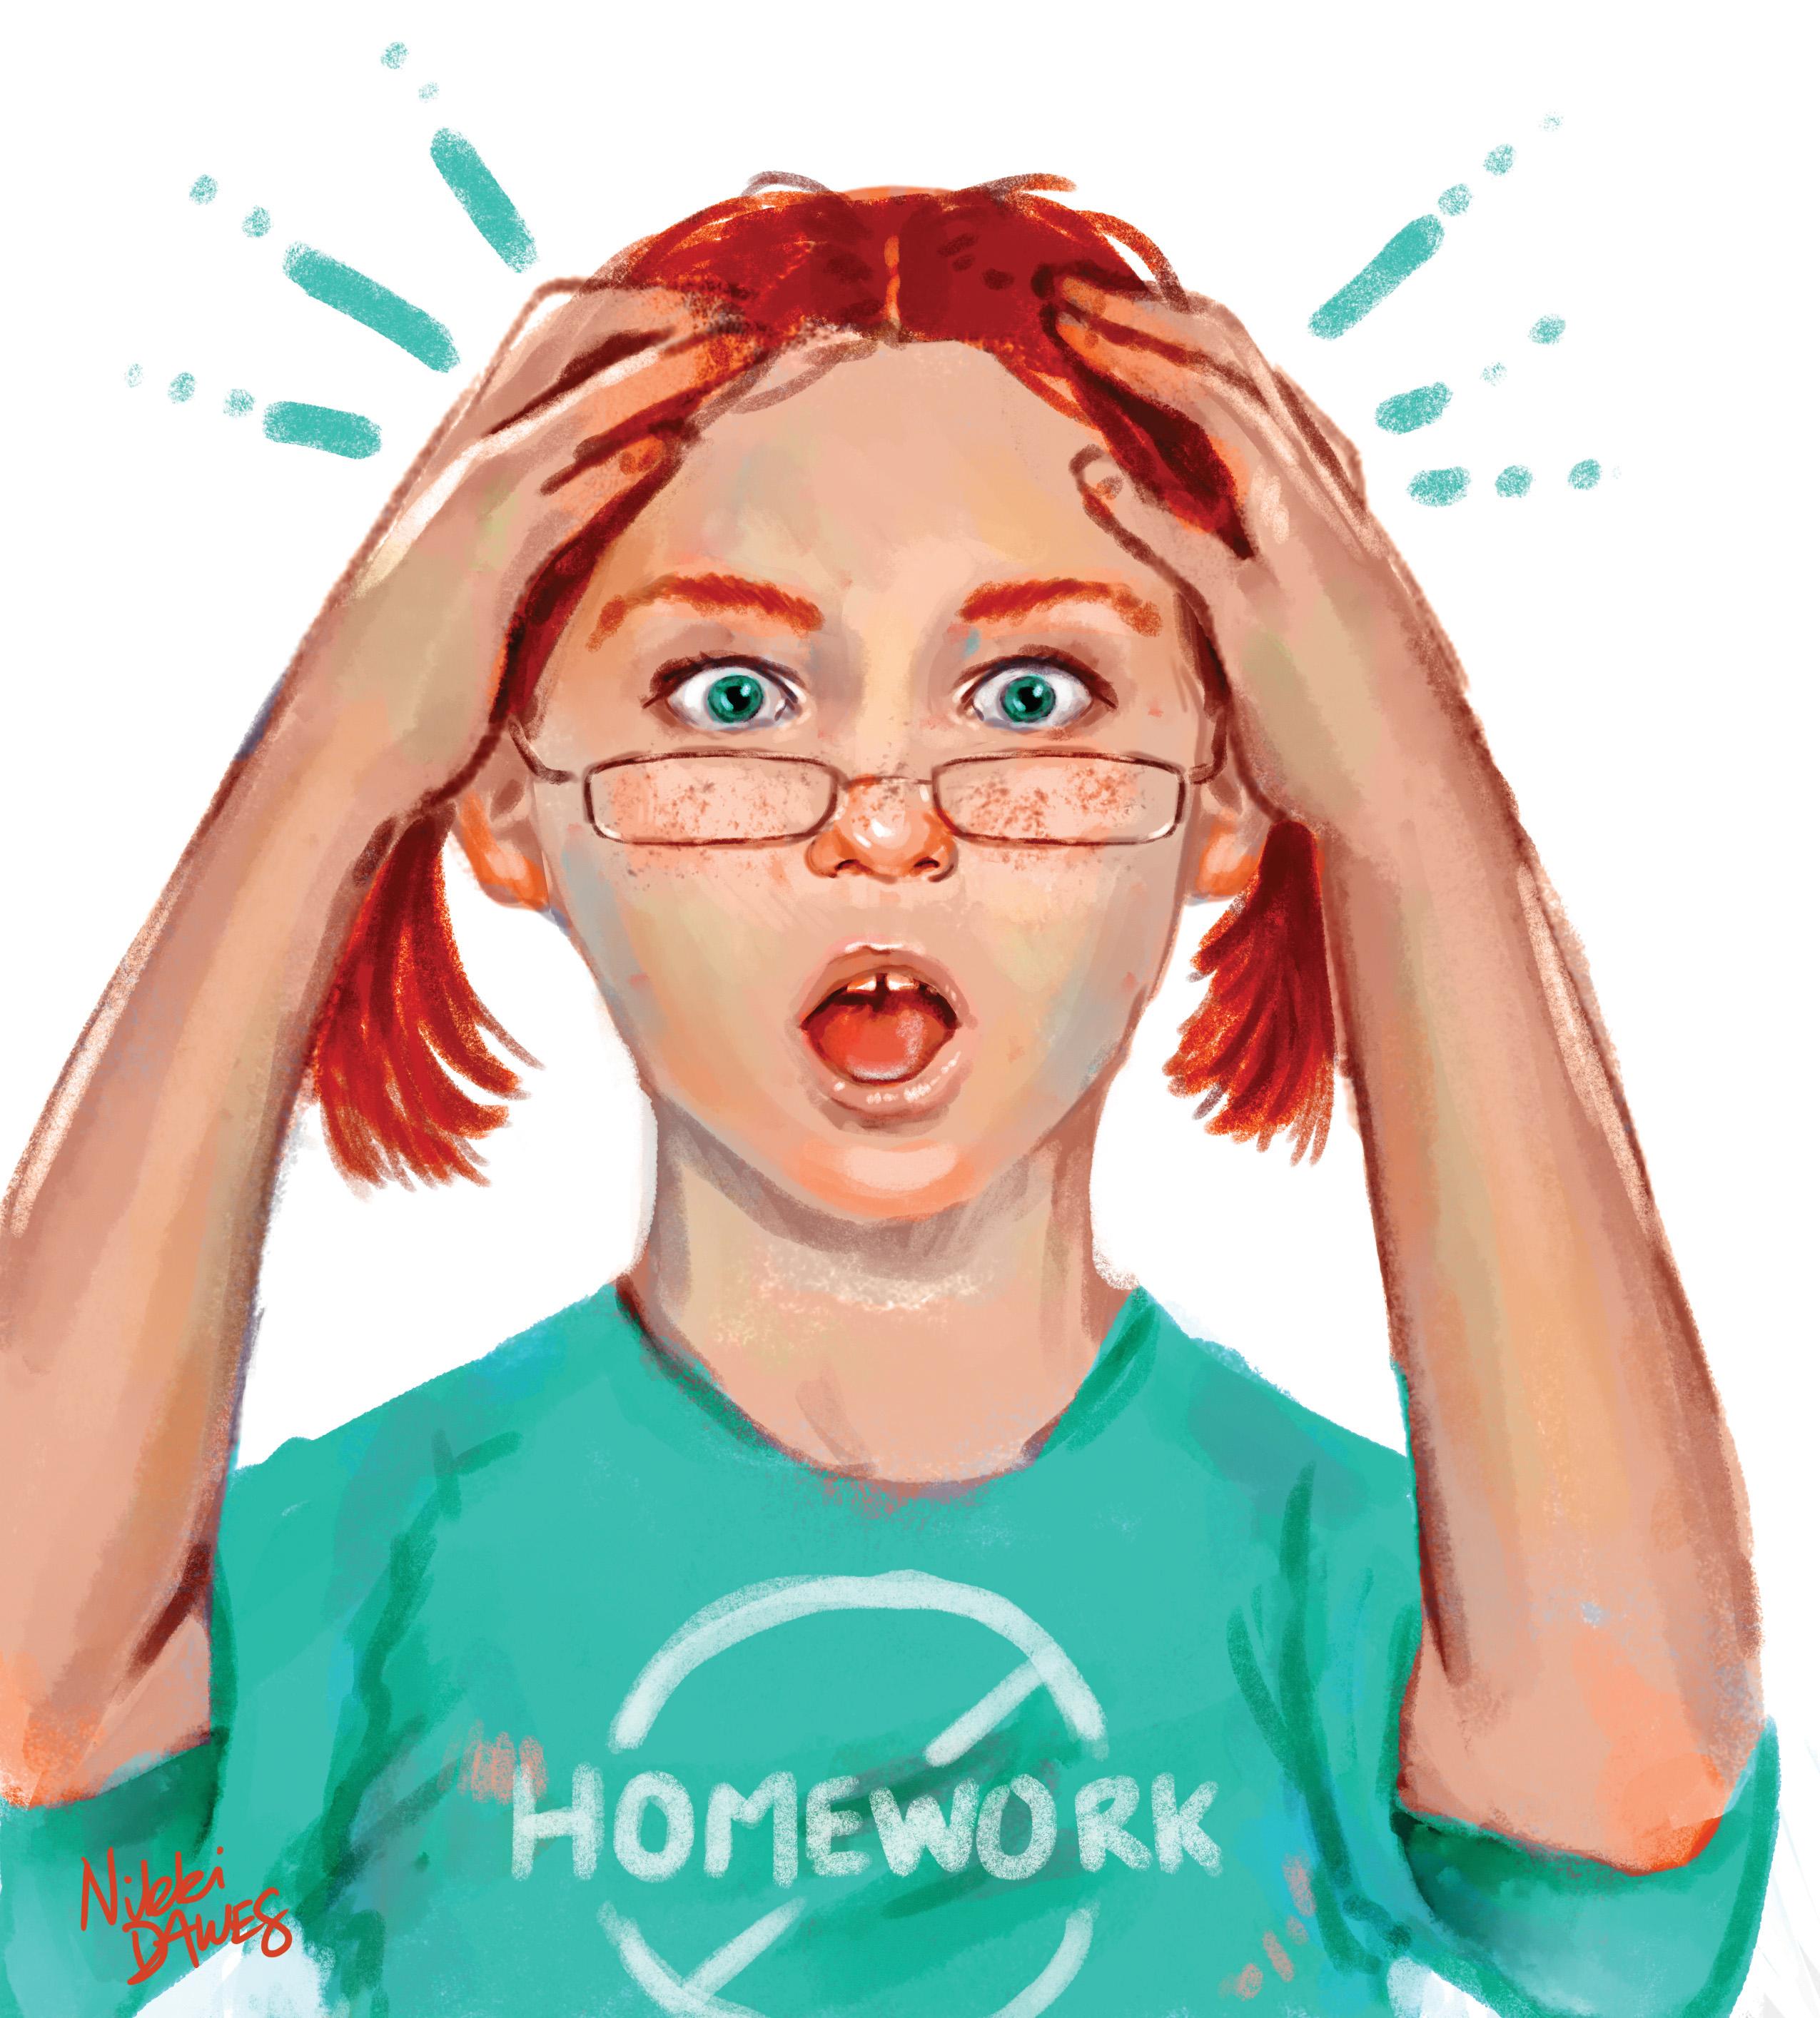 To do online homework